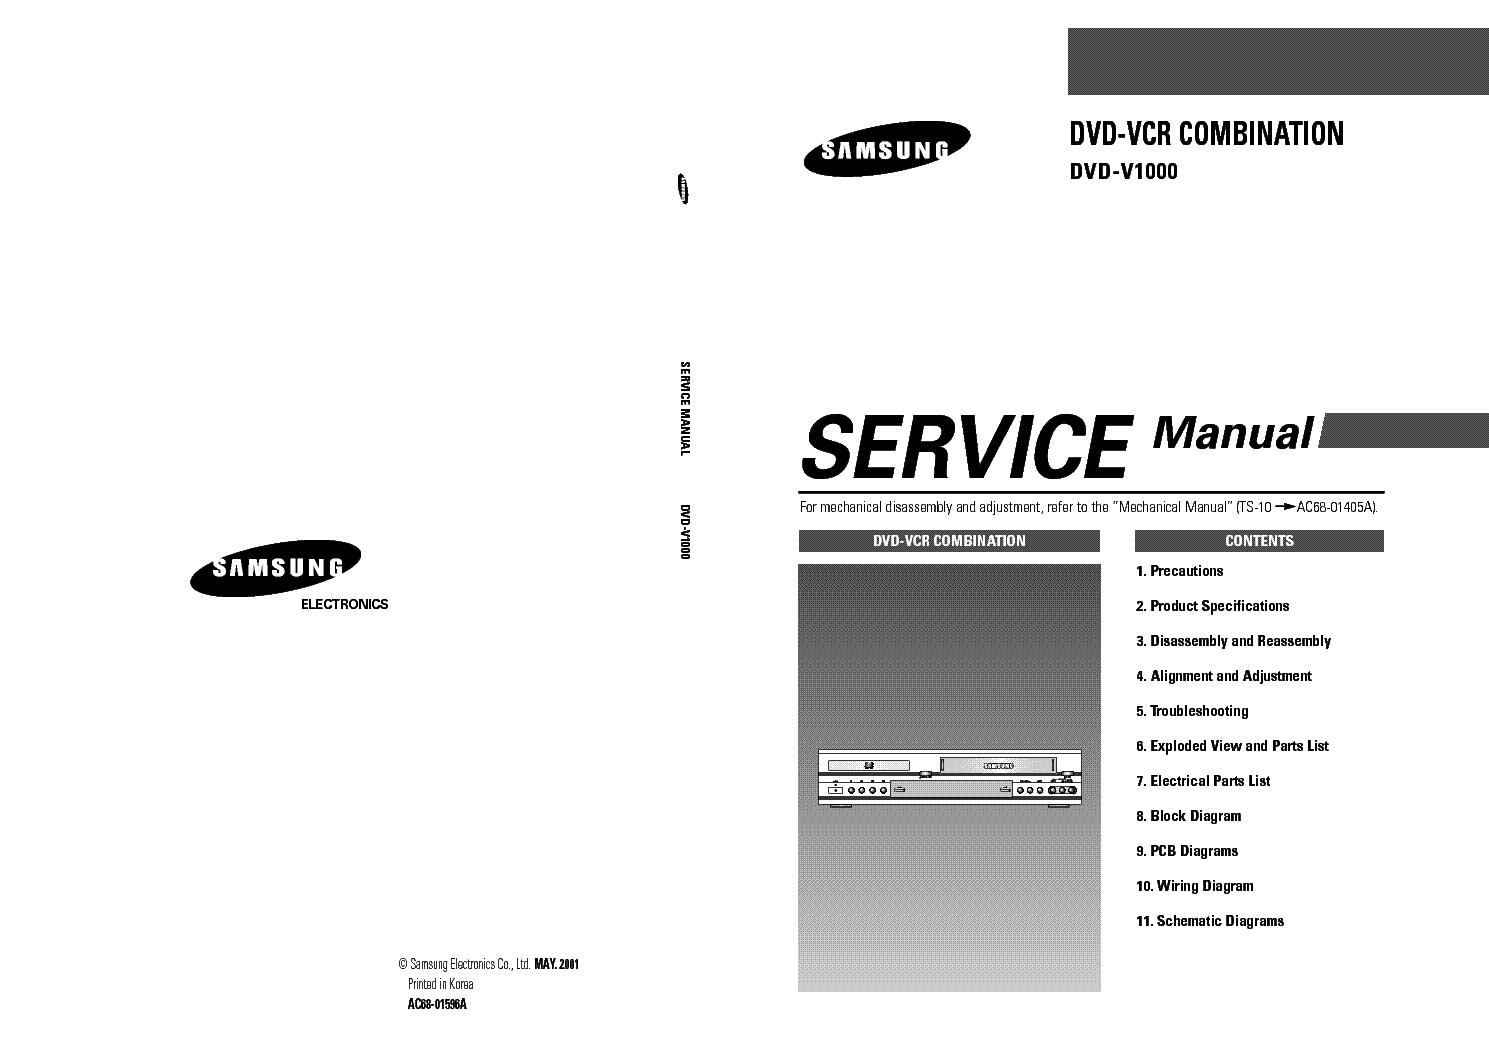 Samsung Dvr Wiring Schematic   manual guide wiring diagram